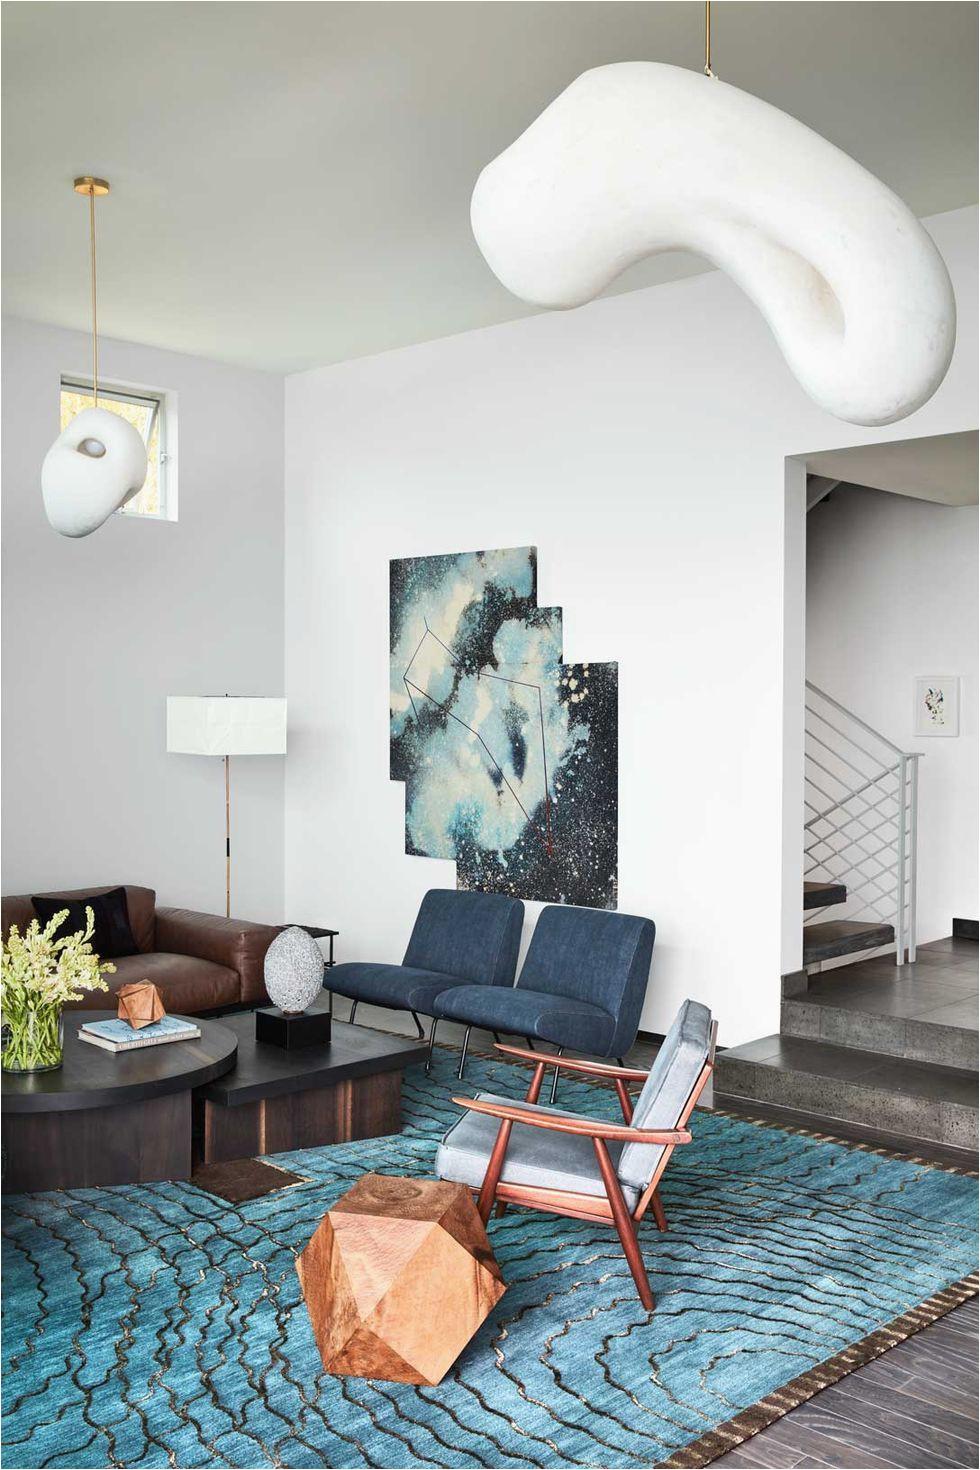 Area Rug Ideas for Family Room 51 Living Room Rug Ideas Stylish area Rugs for Living Rooms